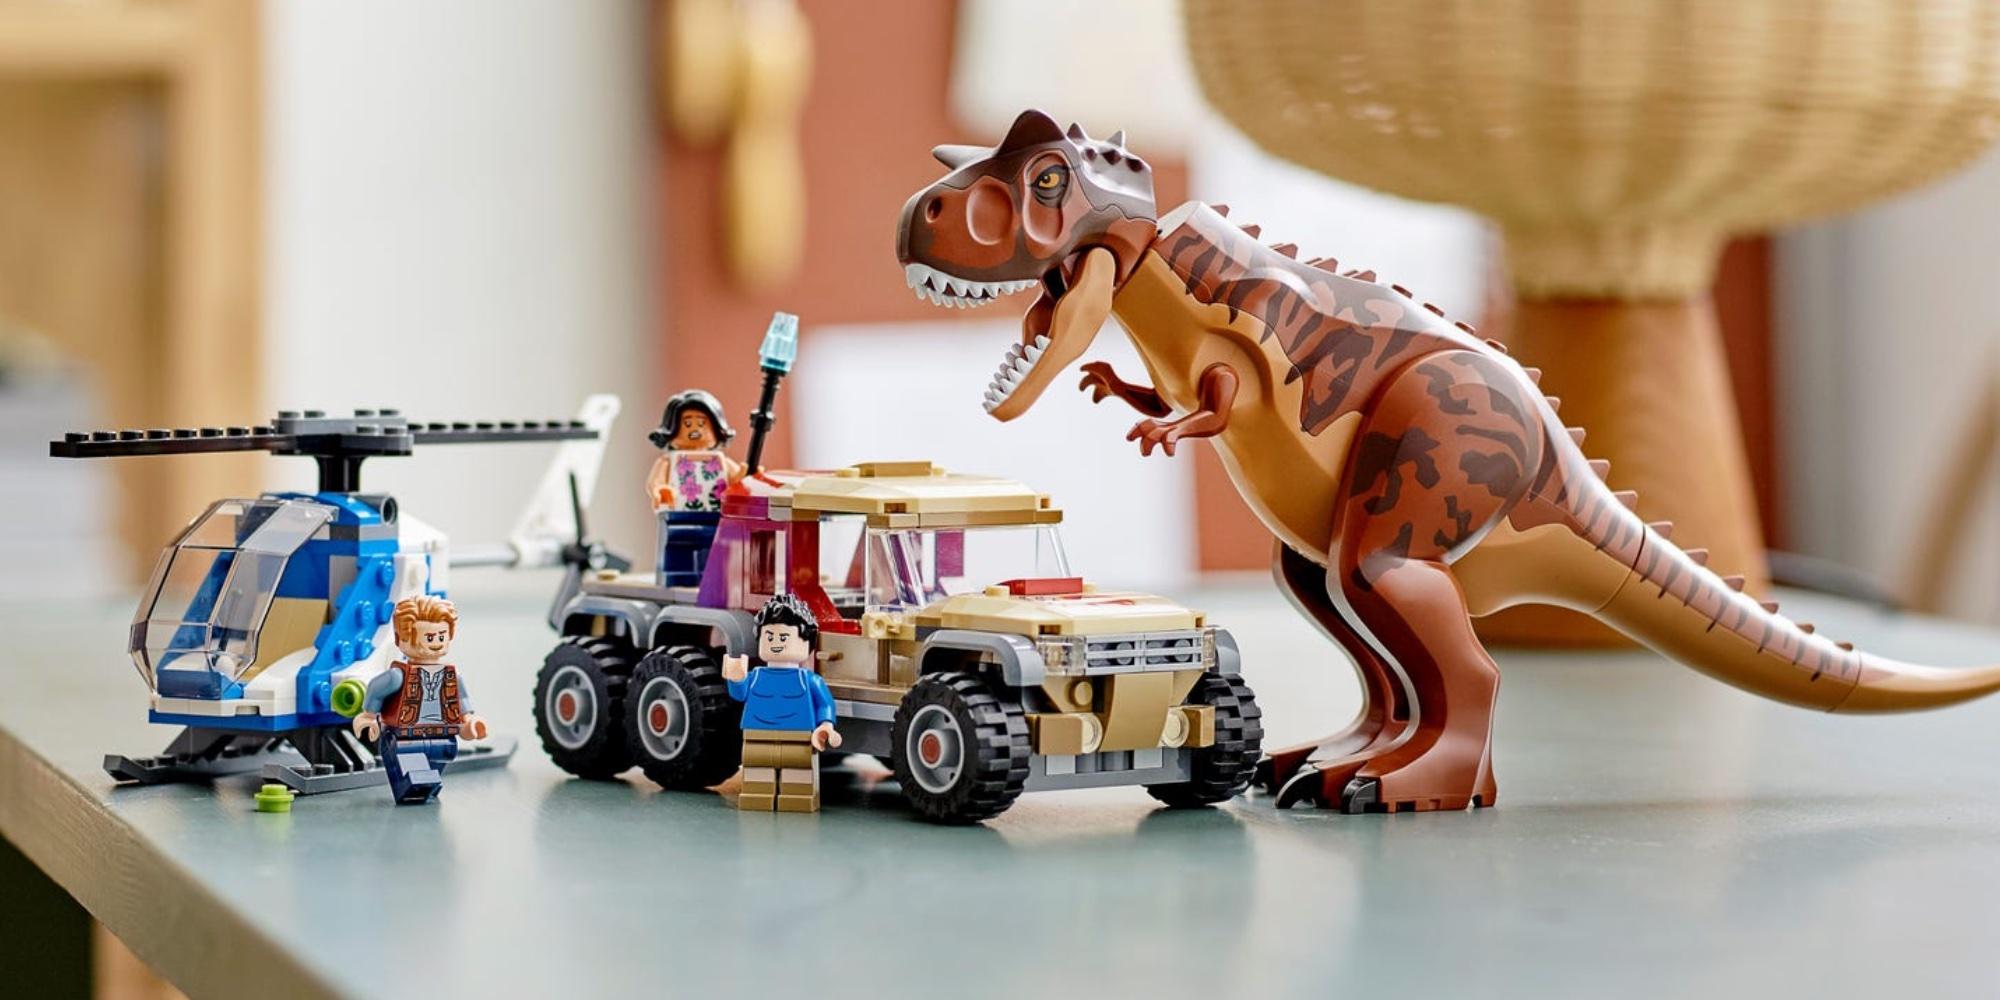 LEGO Jurassic World summer